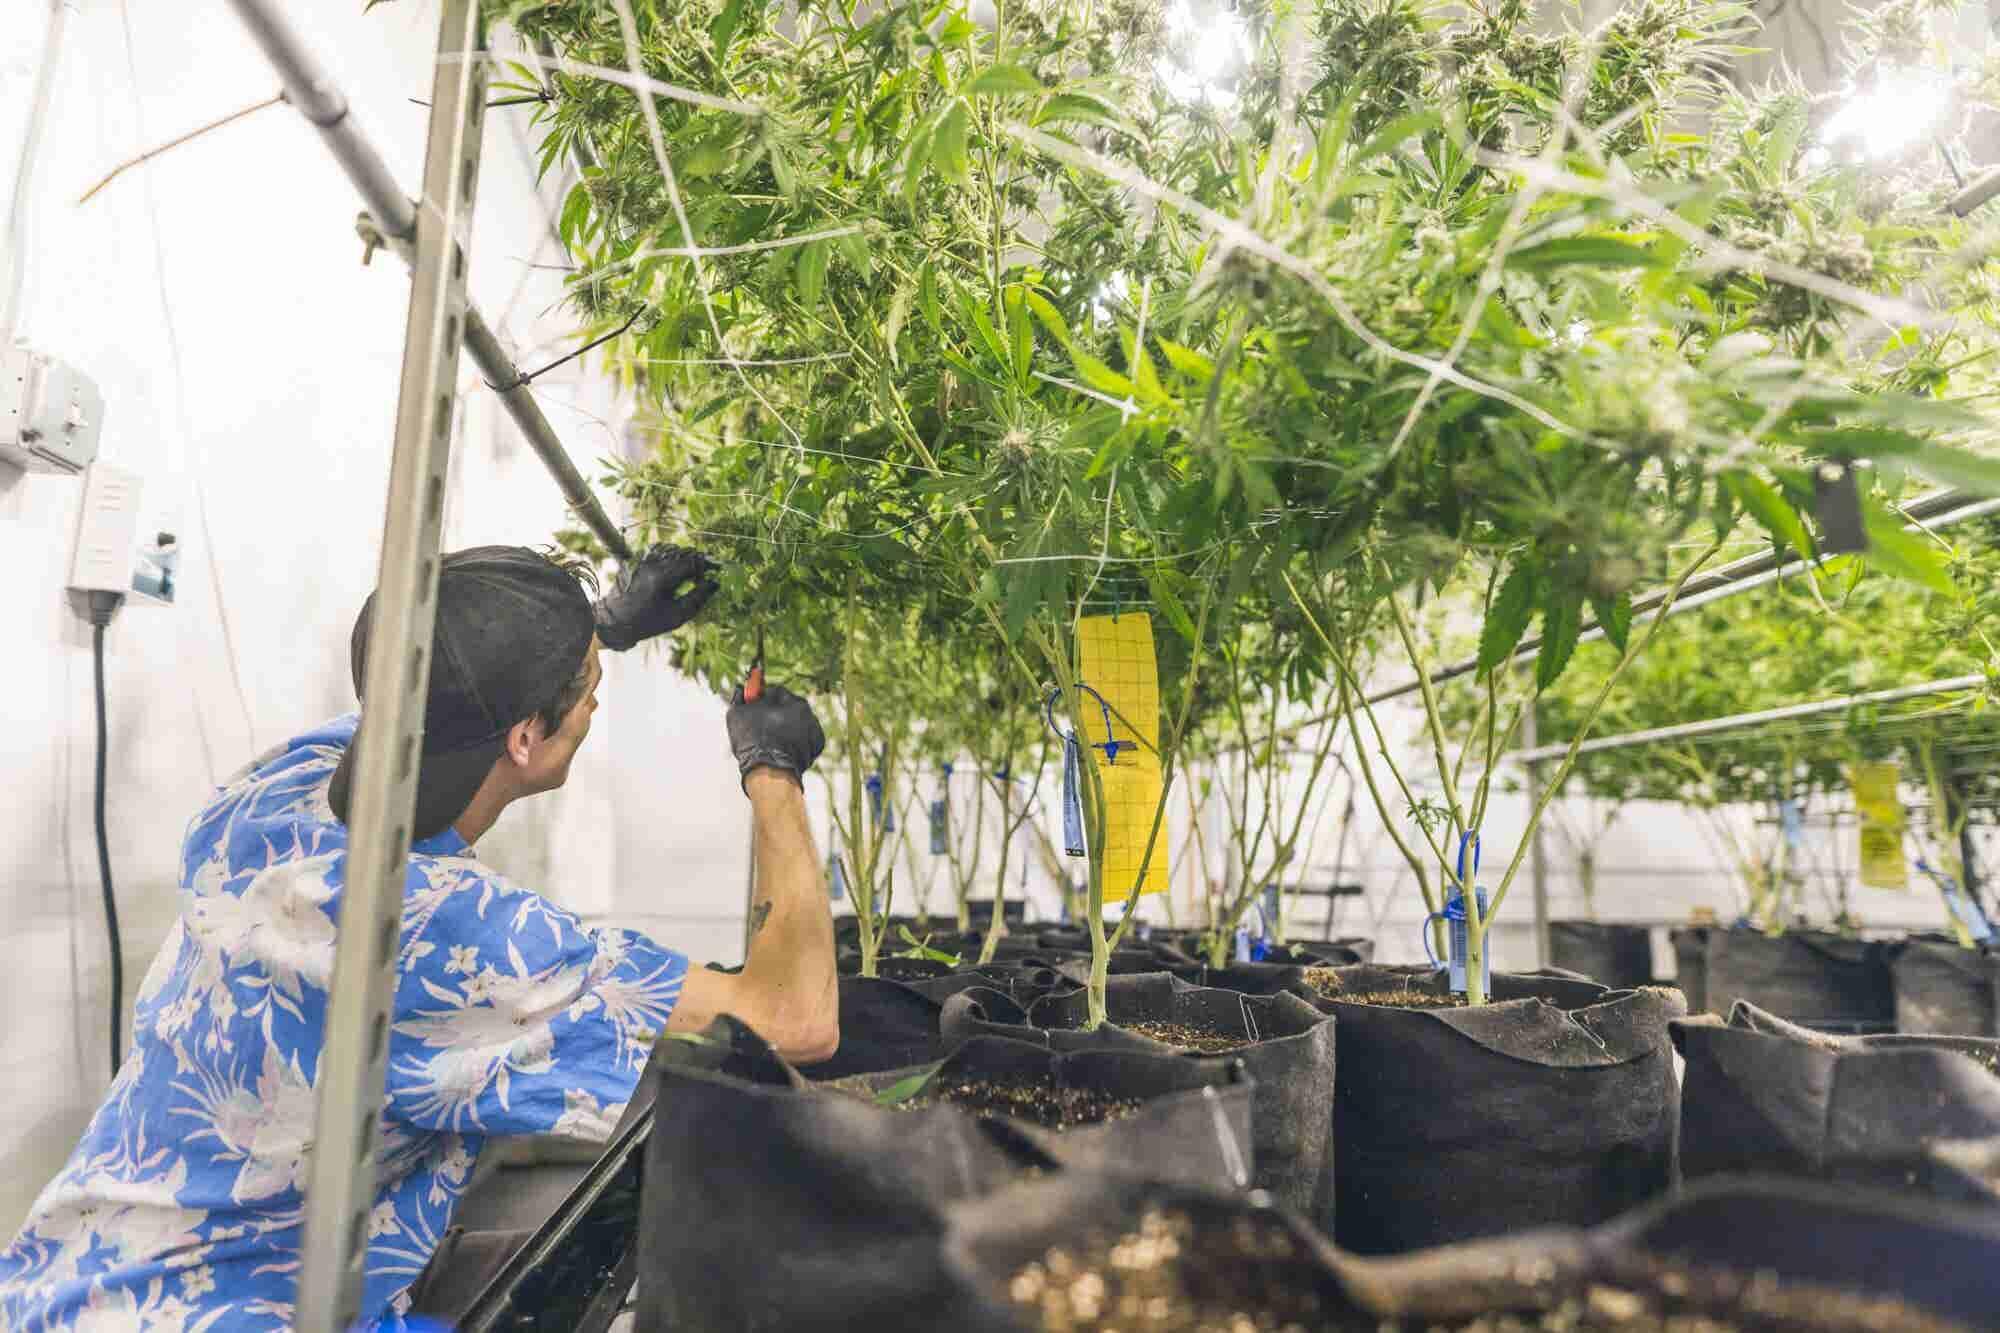 Many Licensed California Marijuana Growers Face Regulatory Roadblocks Getting Their Harvest to Market